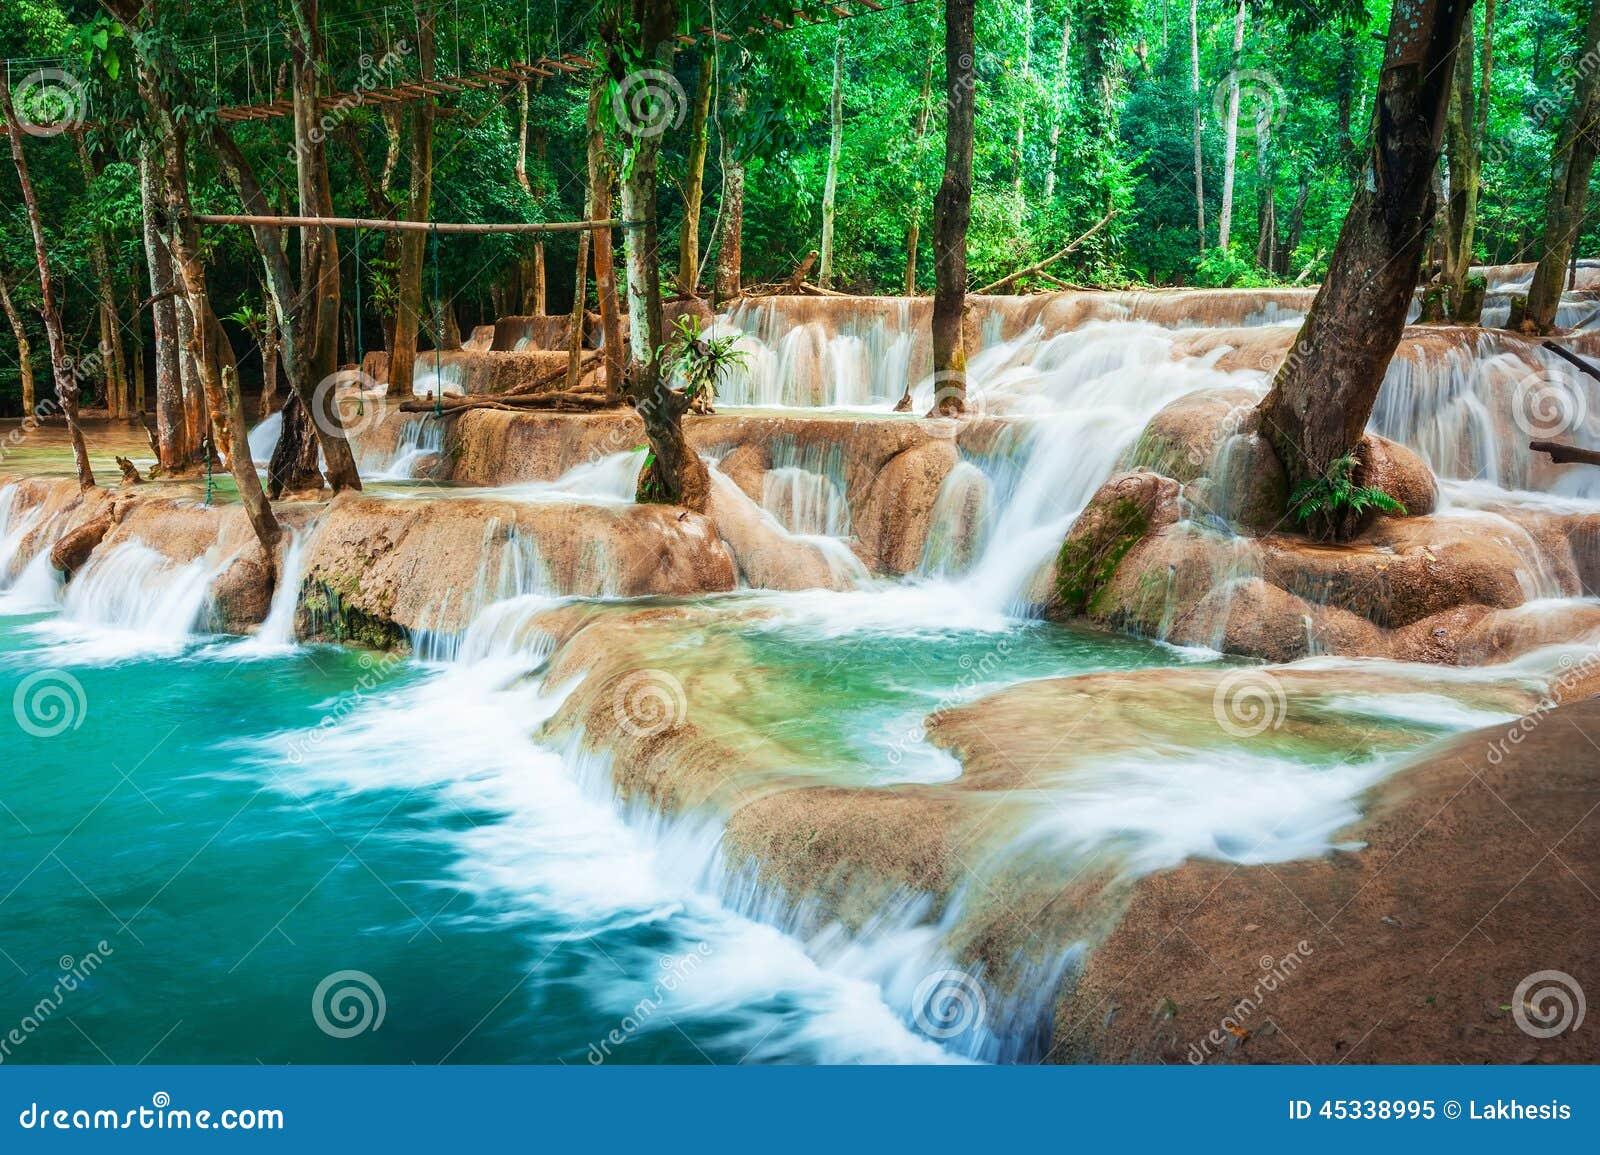 Tropical rain forest with Kuang Si cascade waterfall. Luang Prabang, Laos